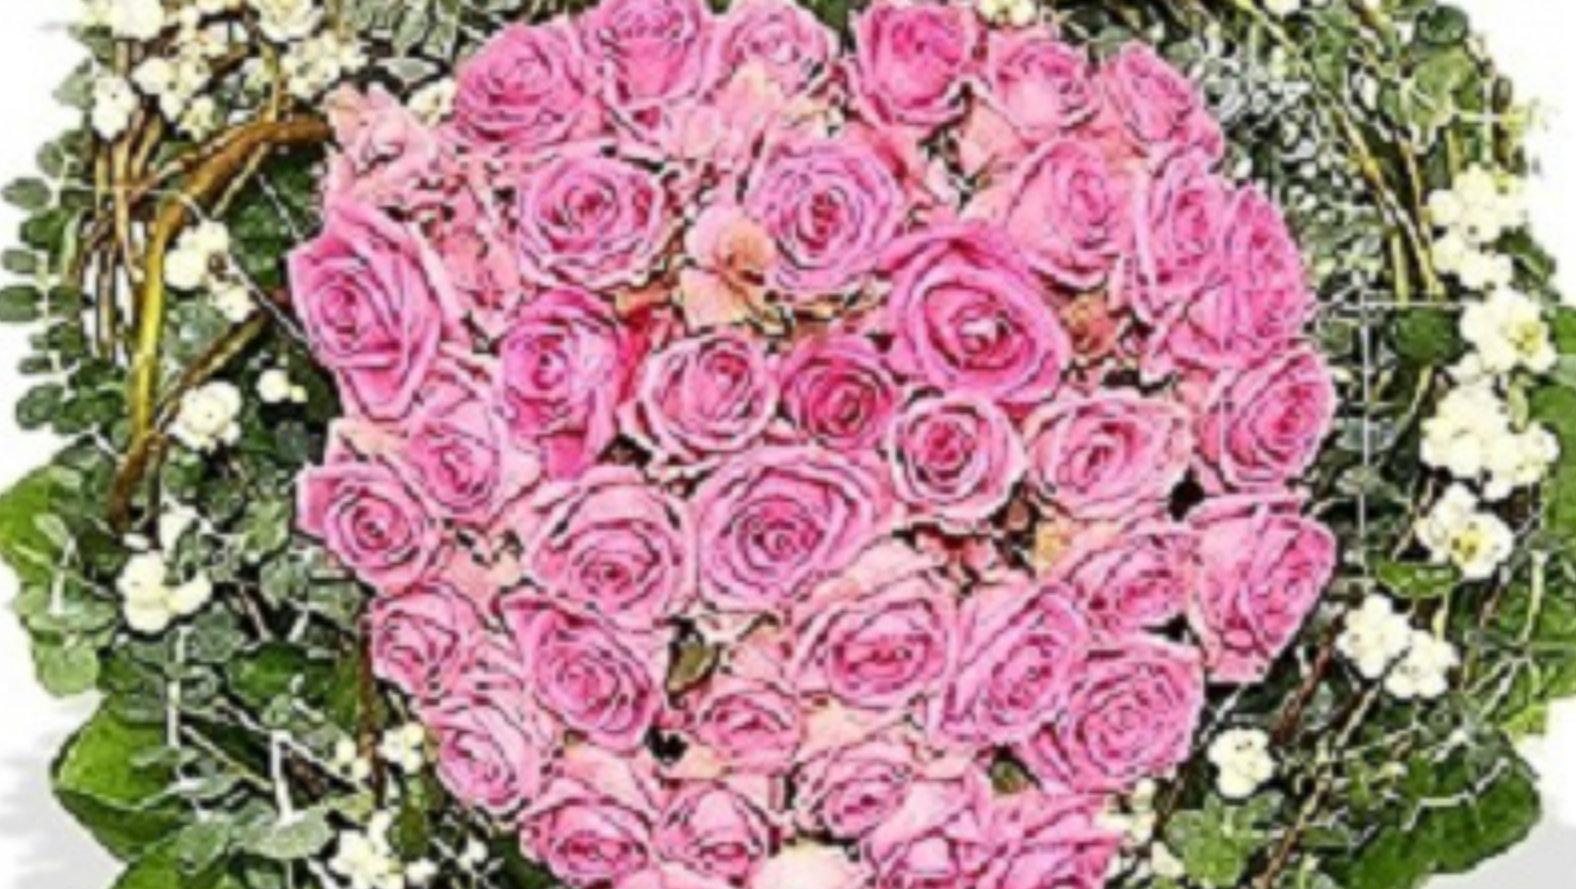 Pink Roses Heart Flower Tribute